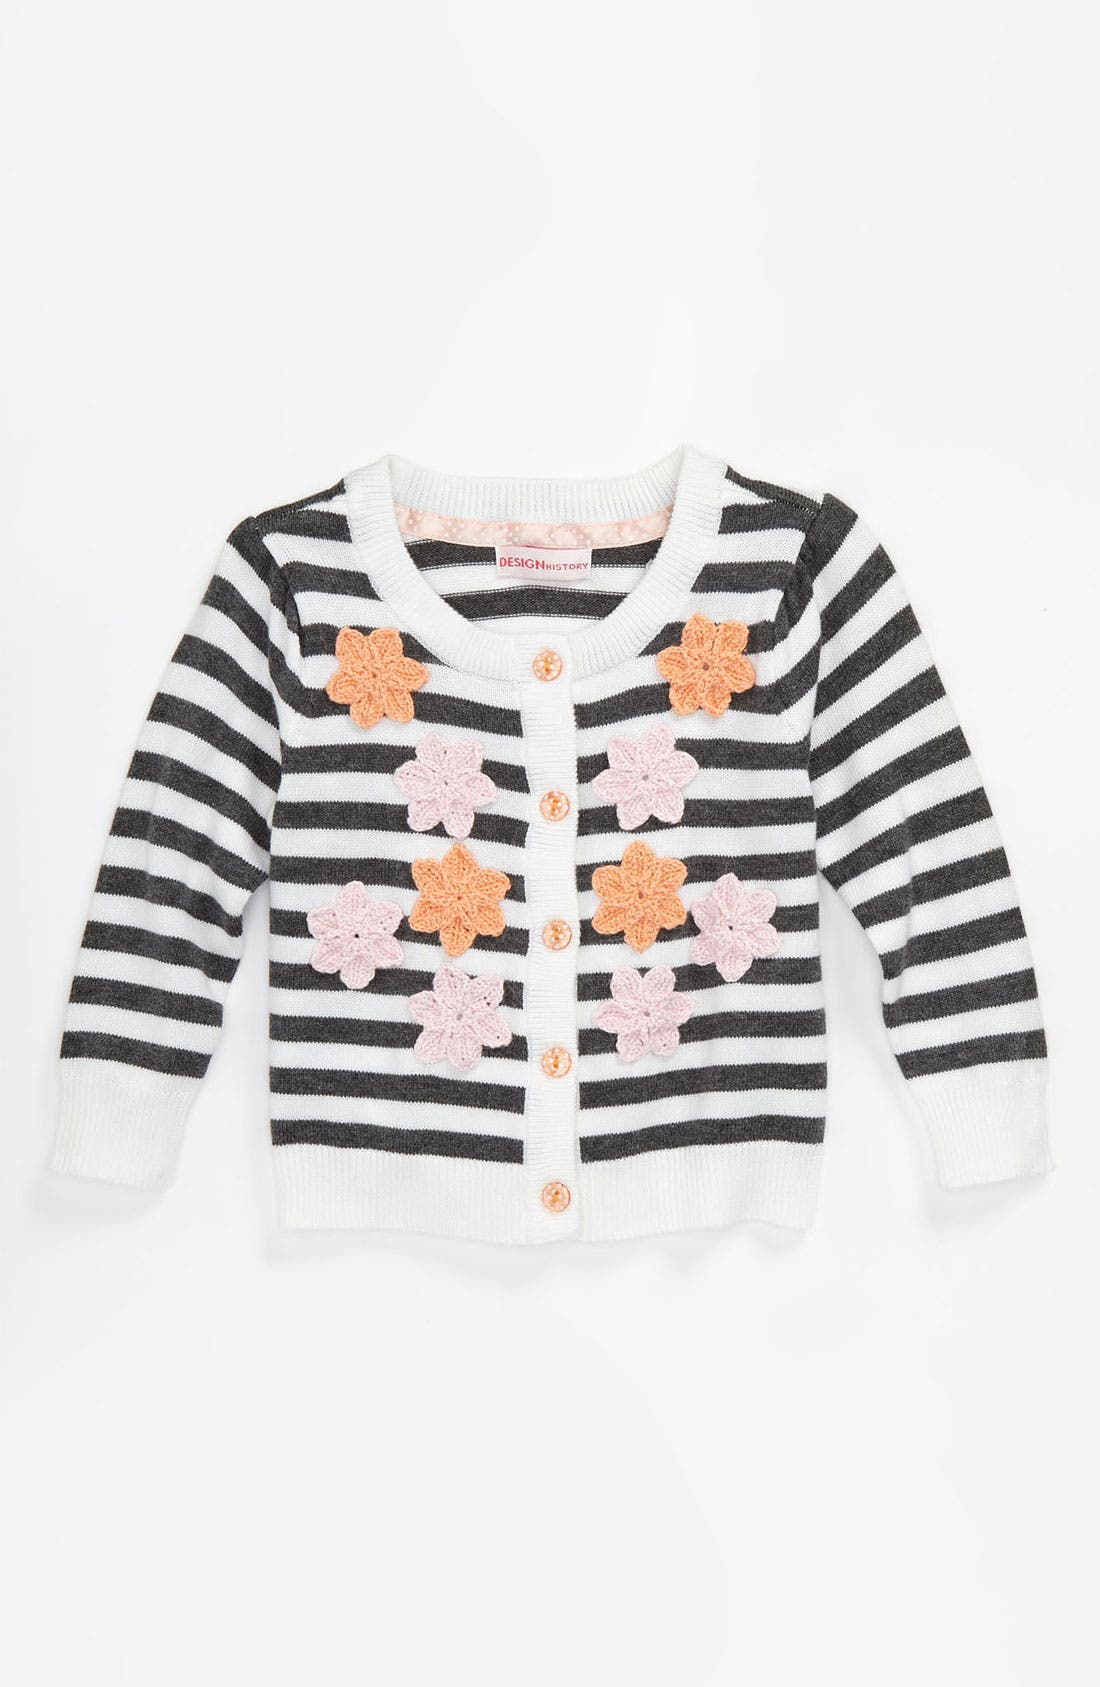 Main Image - Design History Stripe Cardigan (Infant)